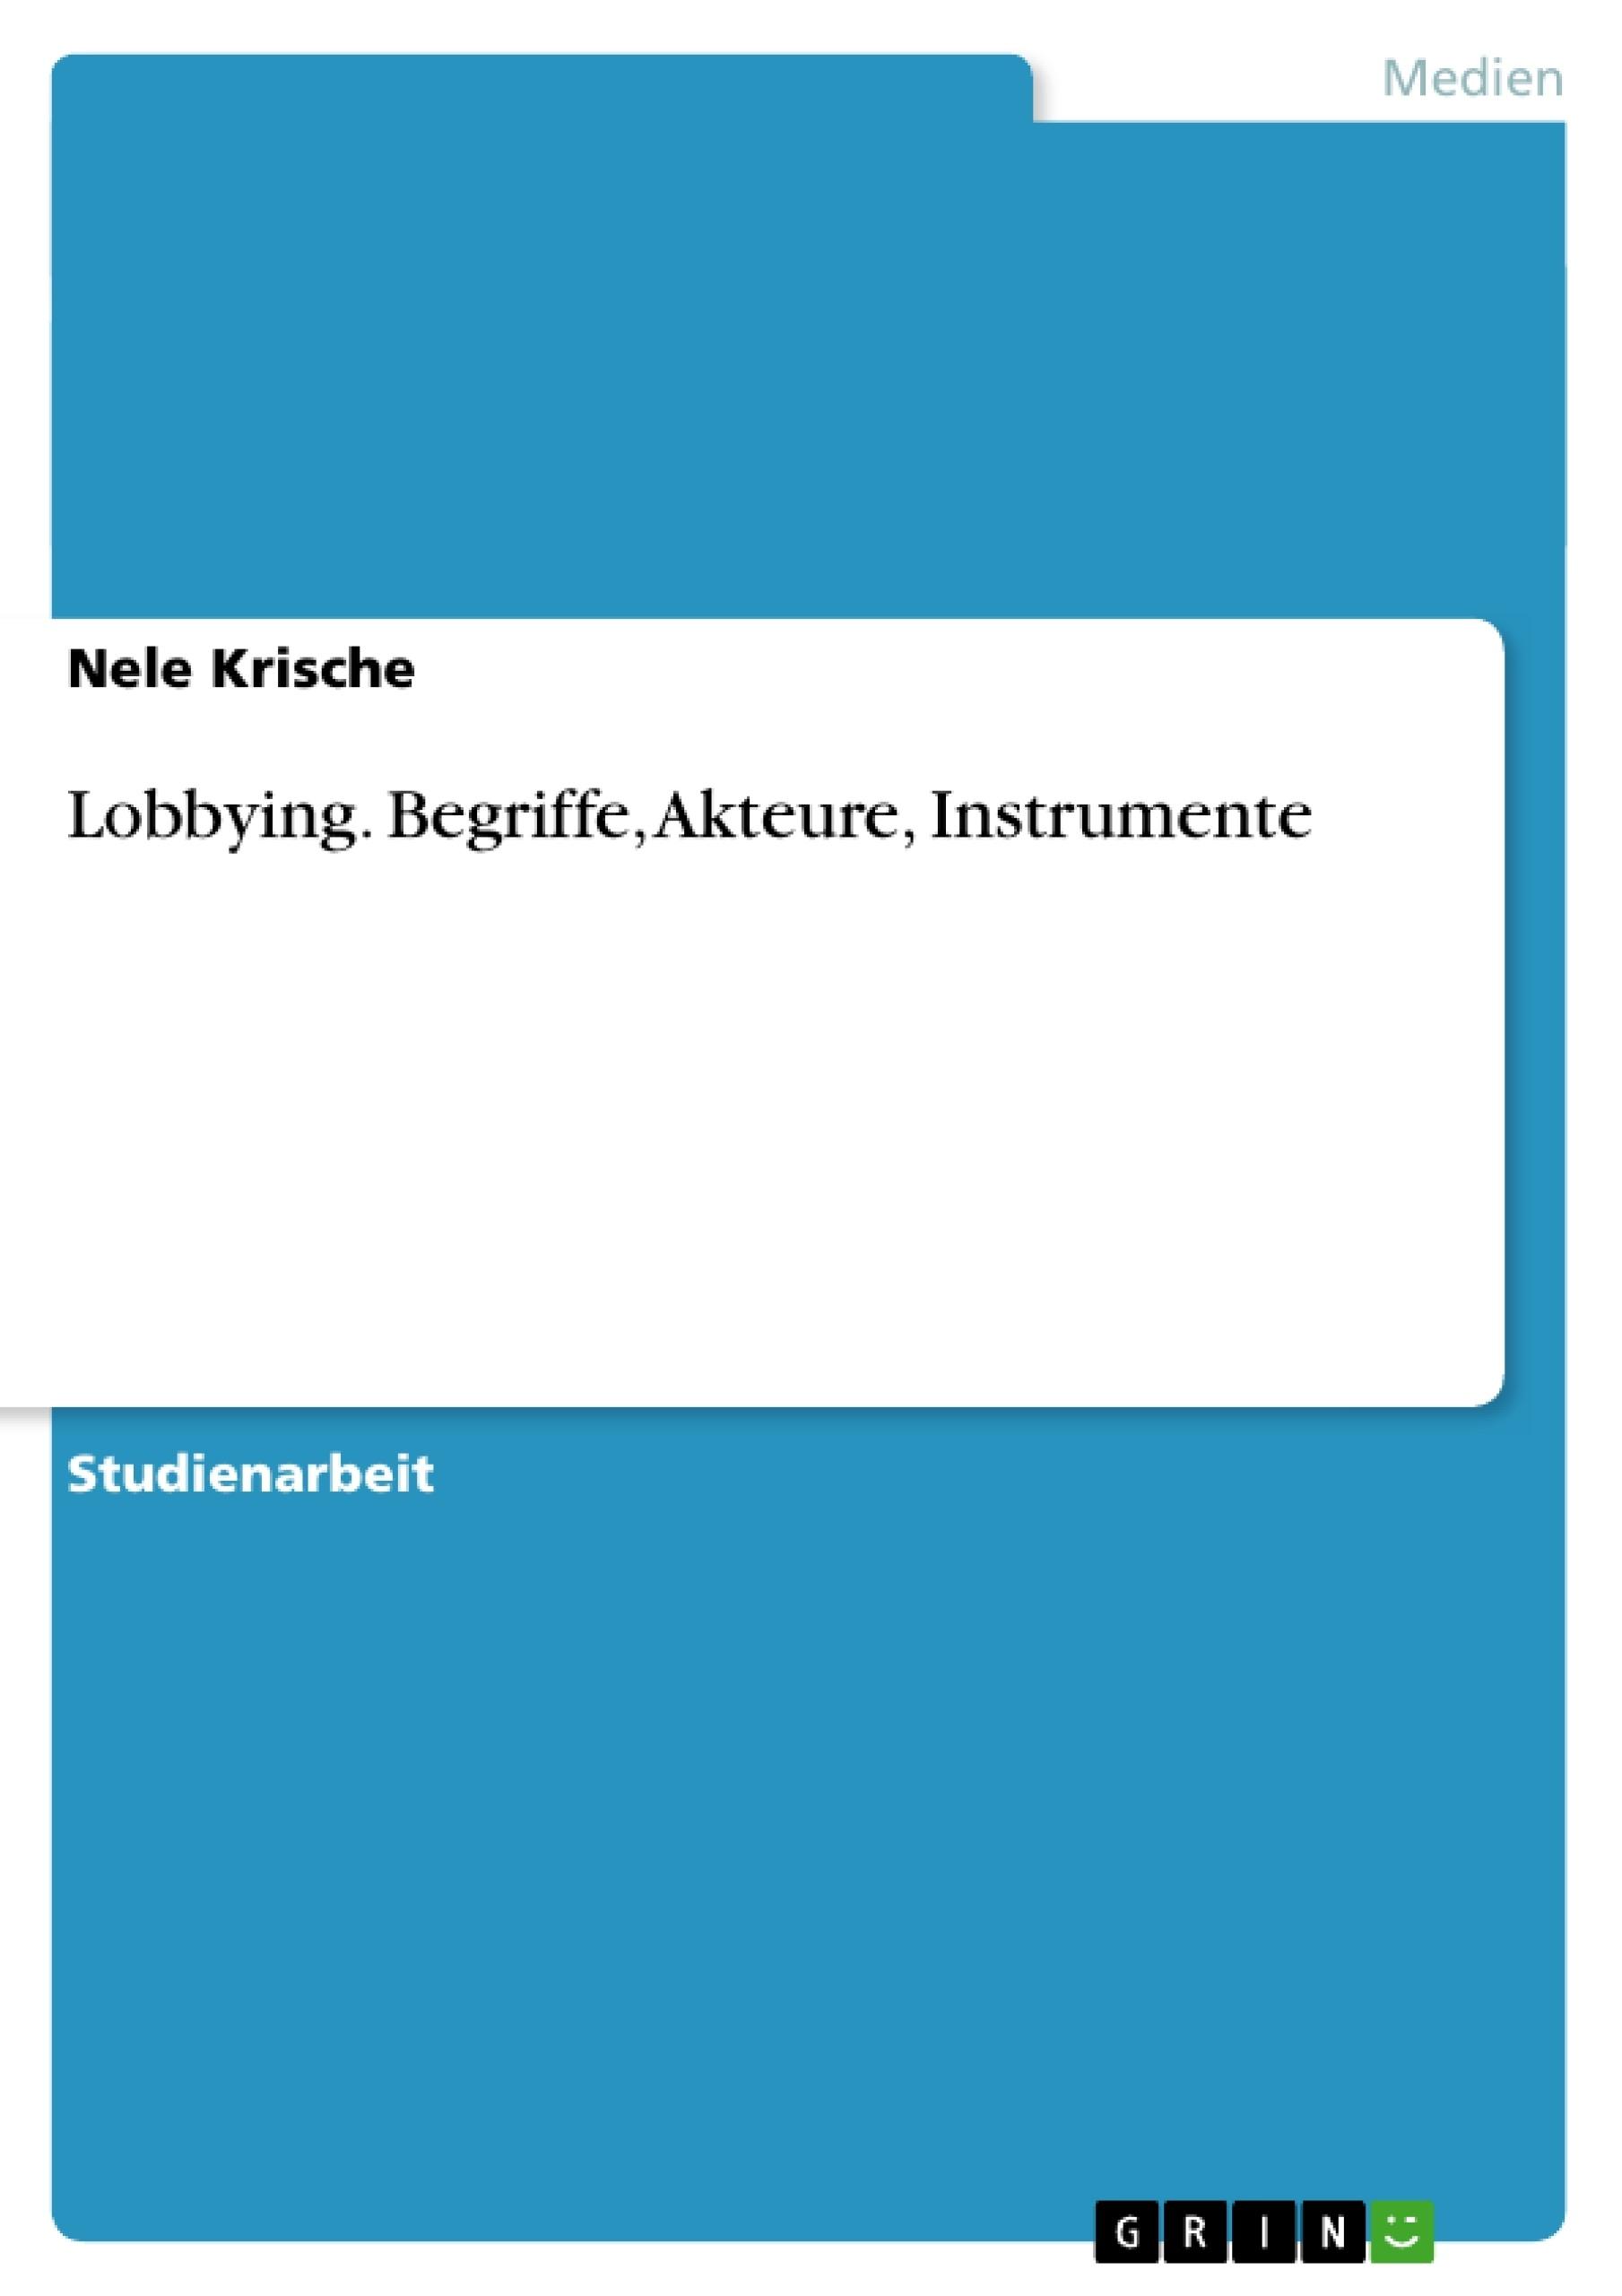 Titel: Lobbying. Begriffe, Akteure, Instrumente